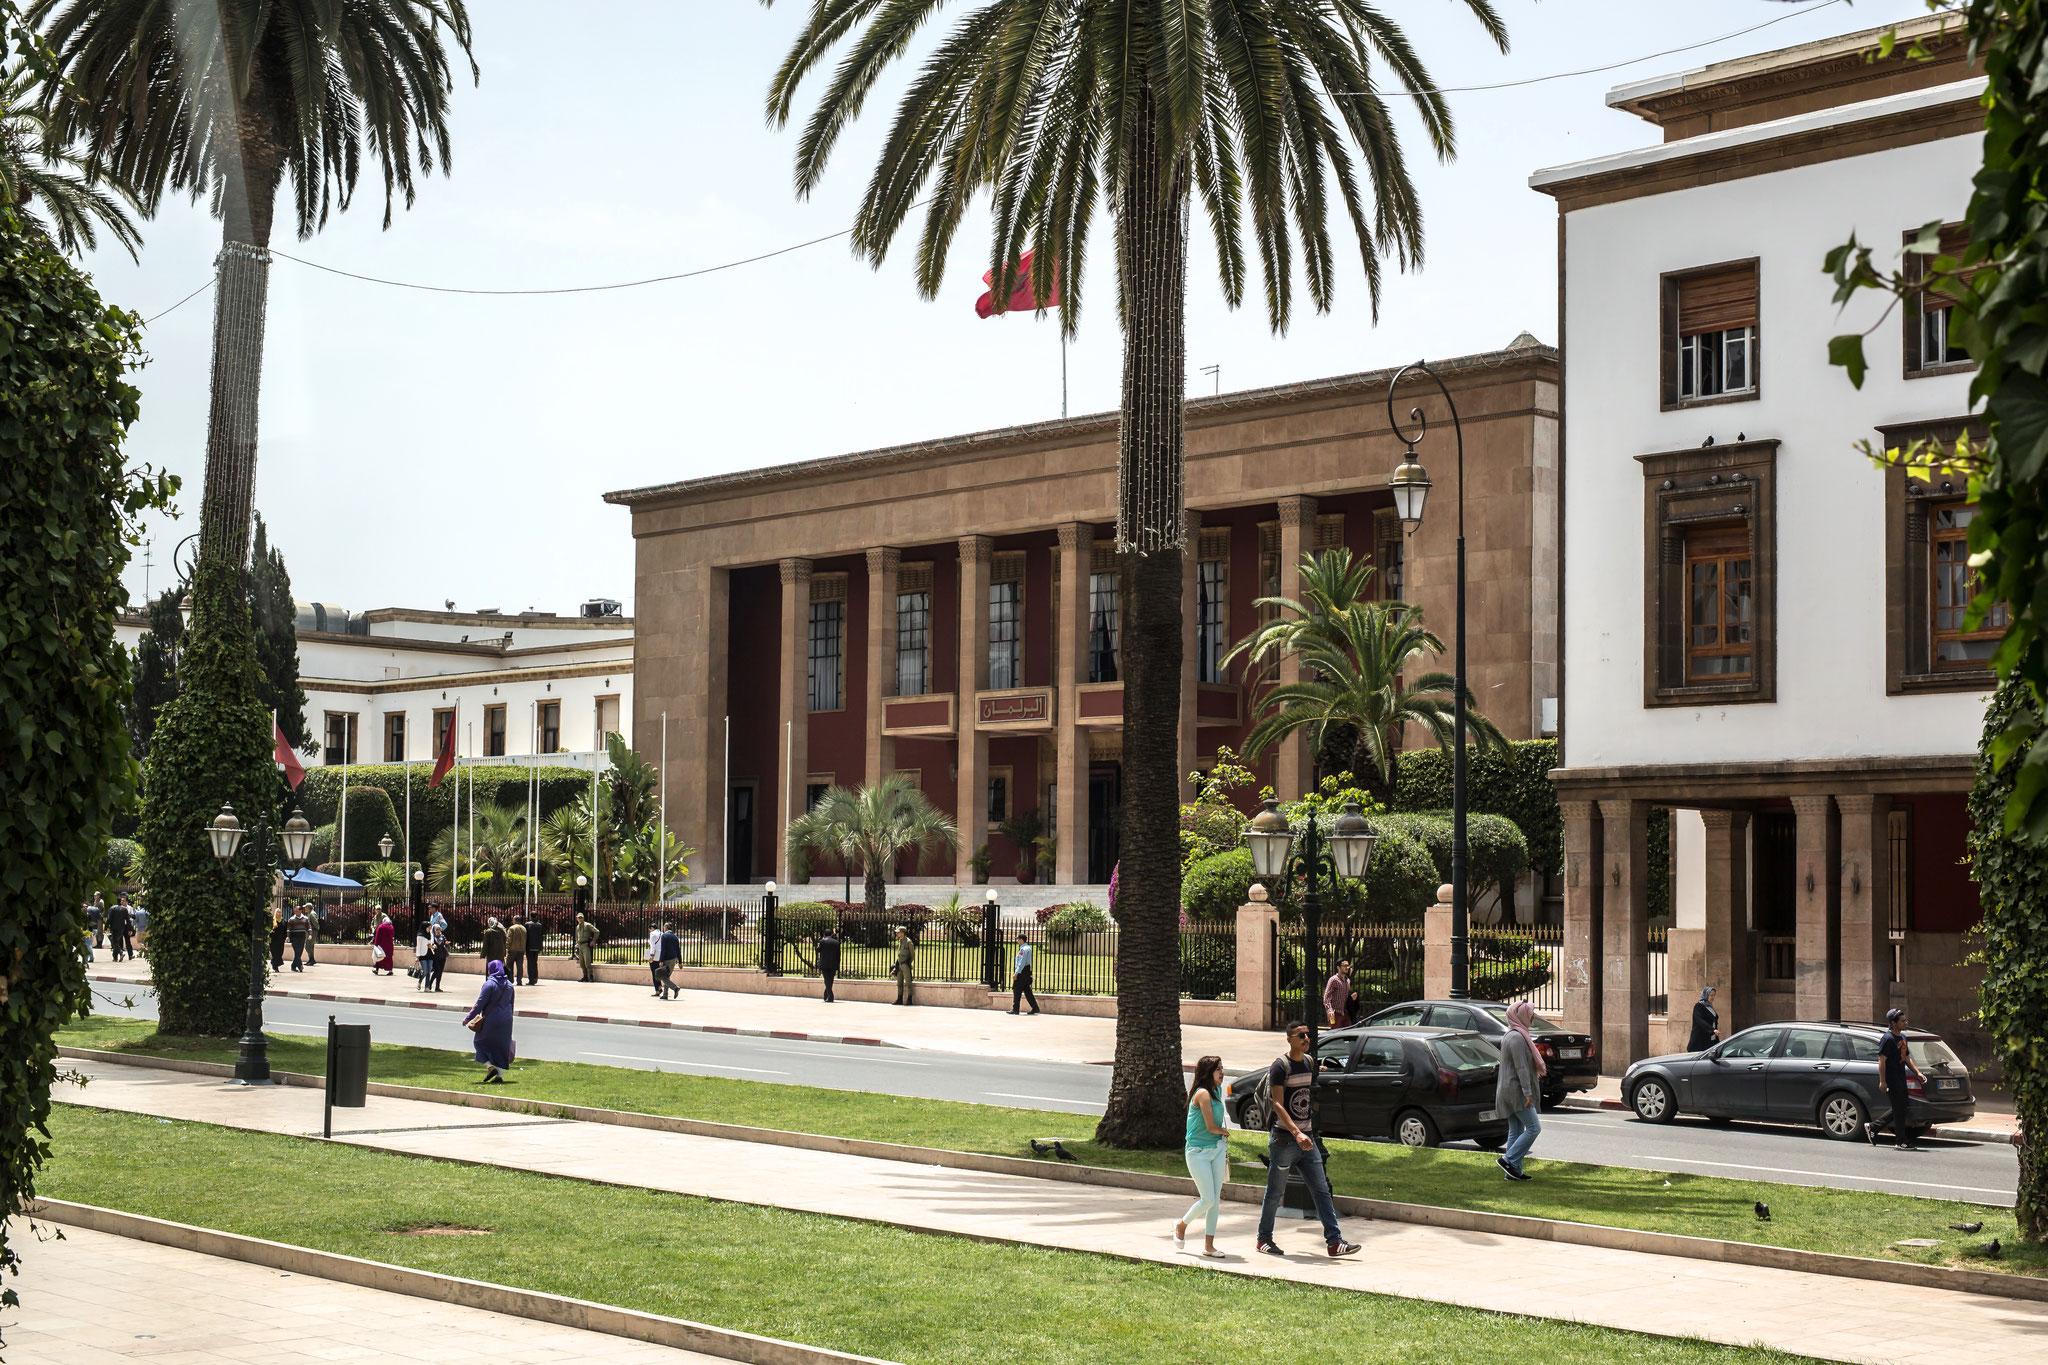 Parlamentsgebäude in Rabat.